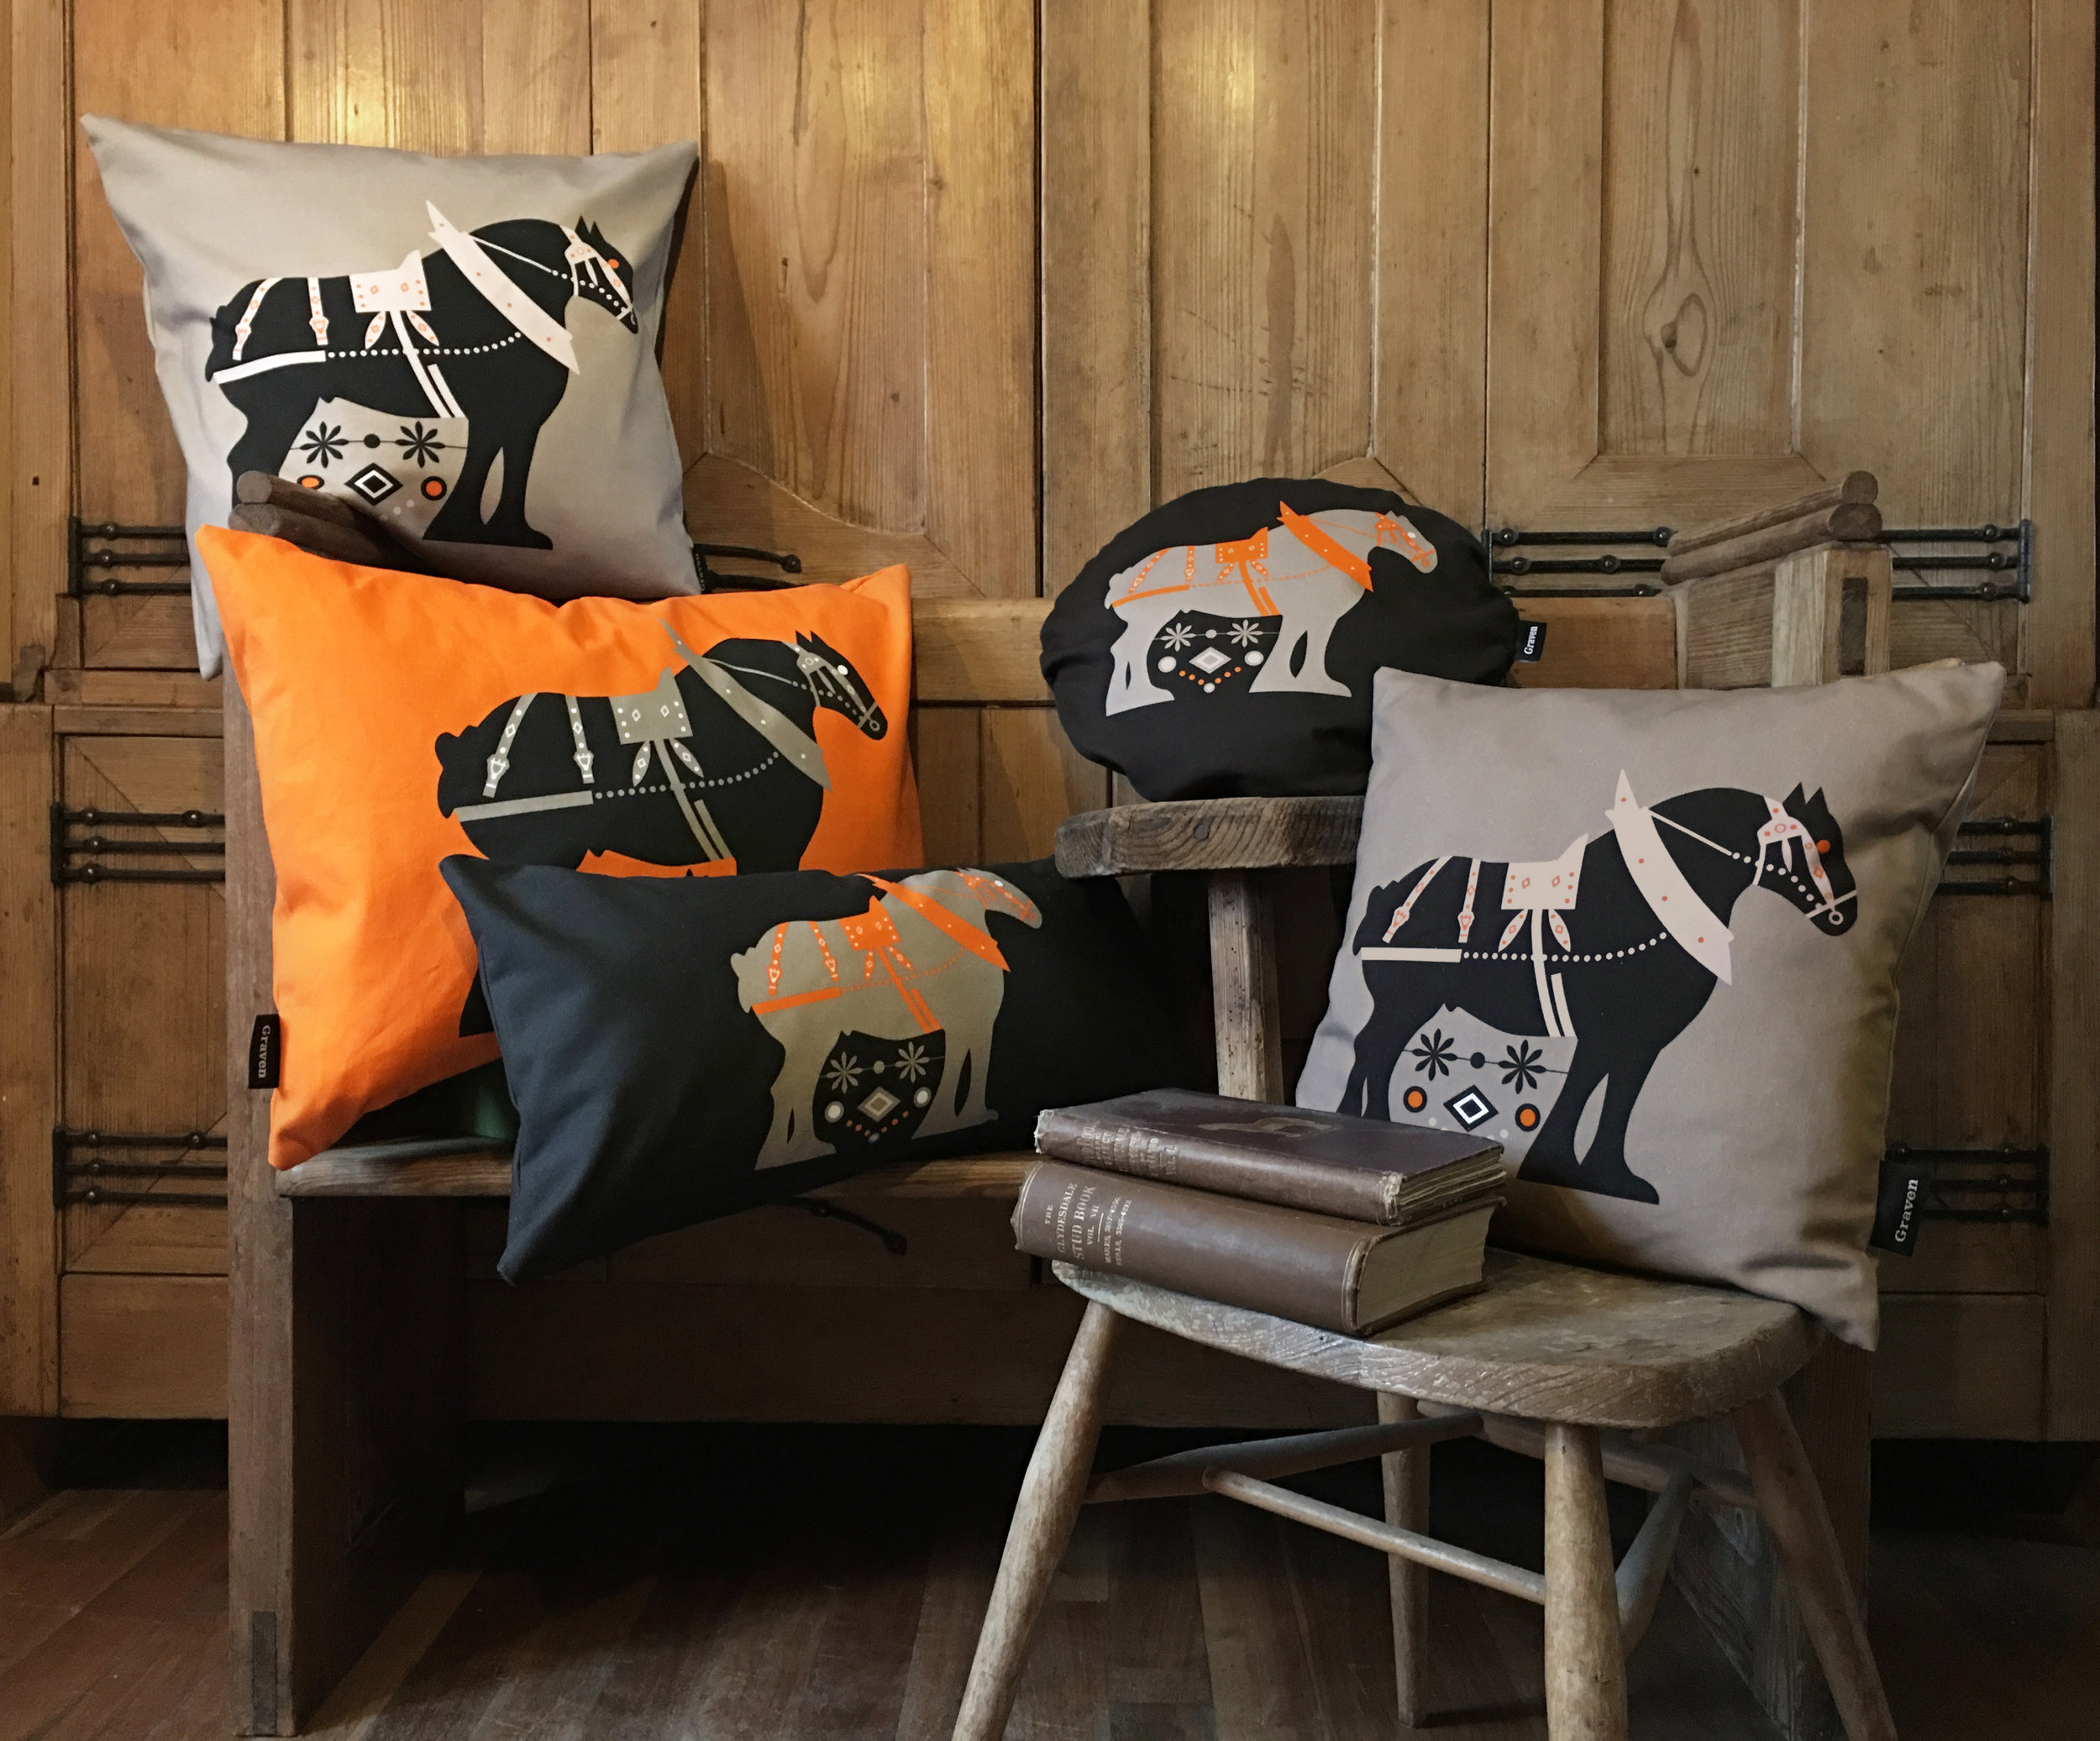 3.0_Sunday Clydesdale cushions.jpg